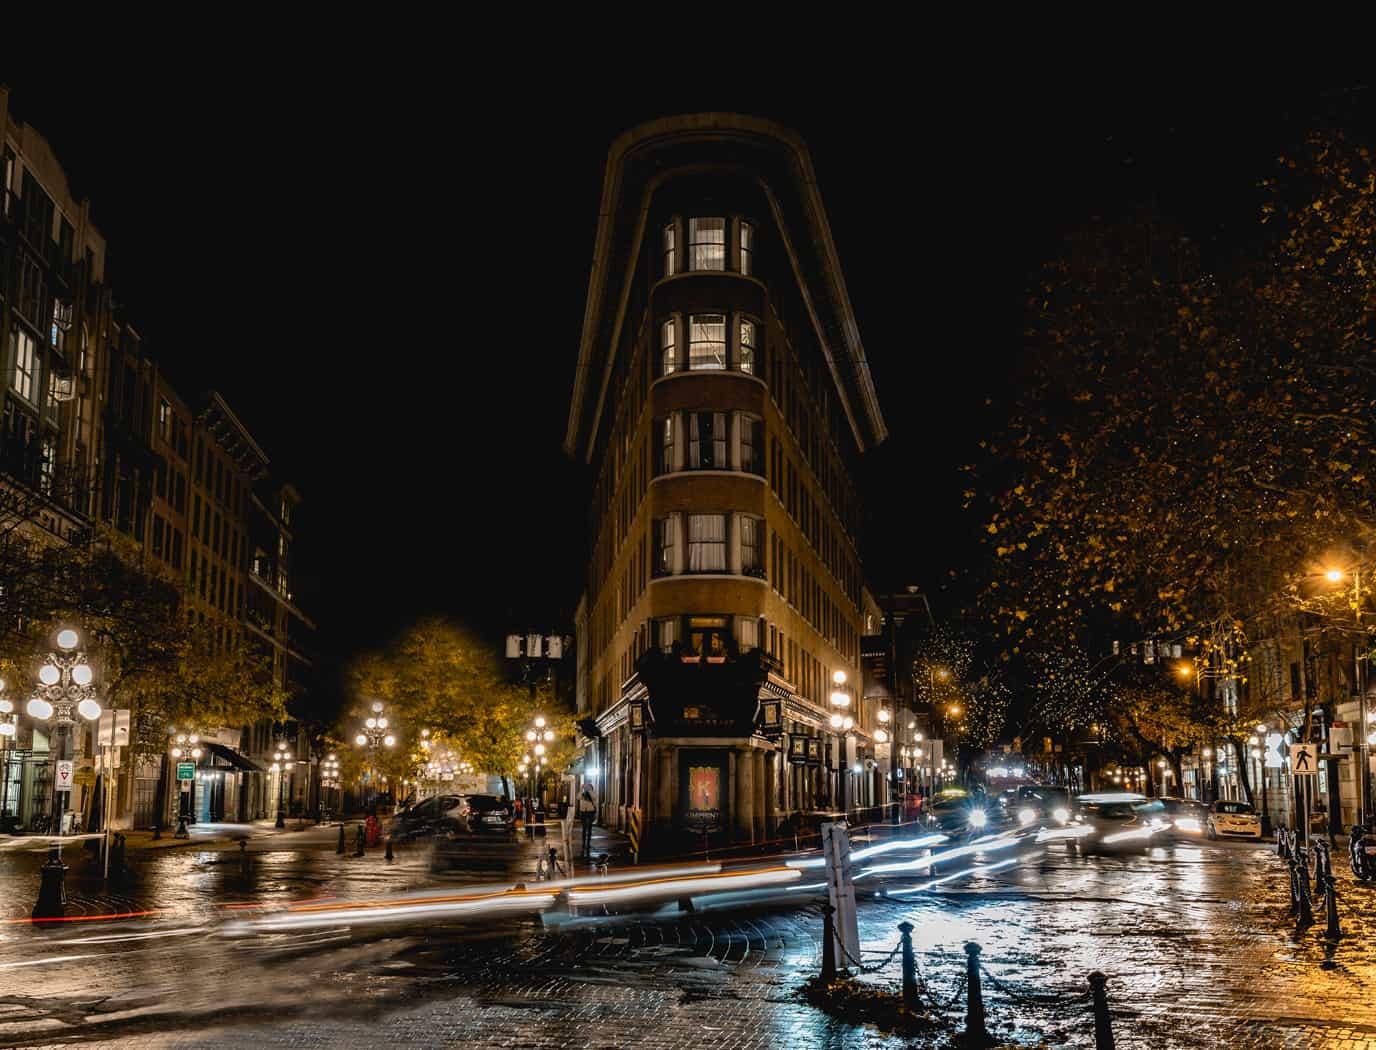 Wet Slippery Streets by Arlette Hatcher